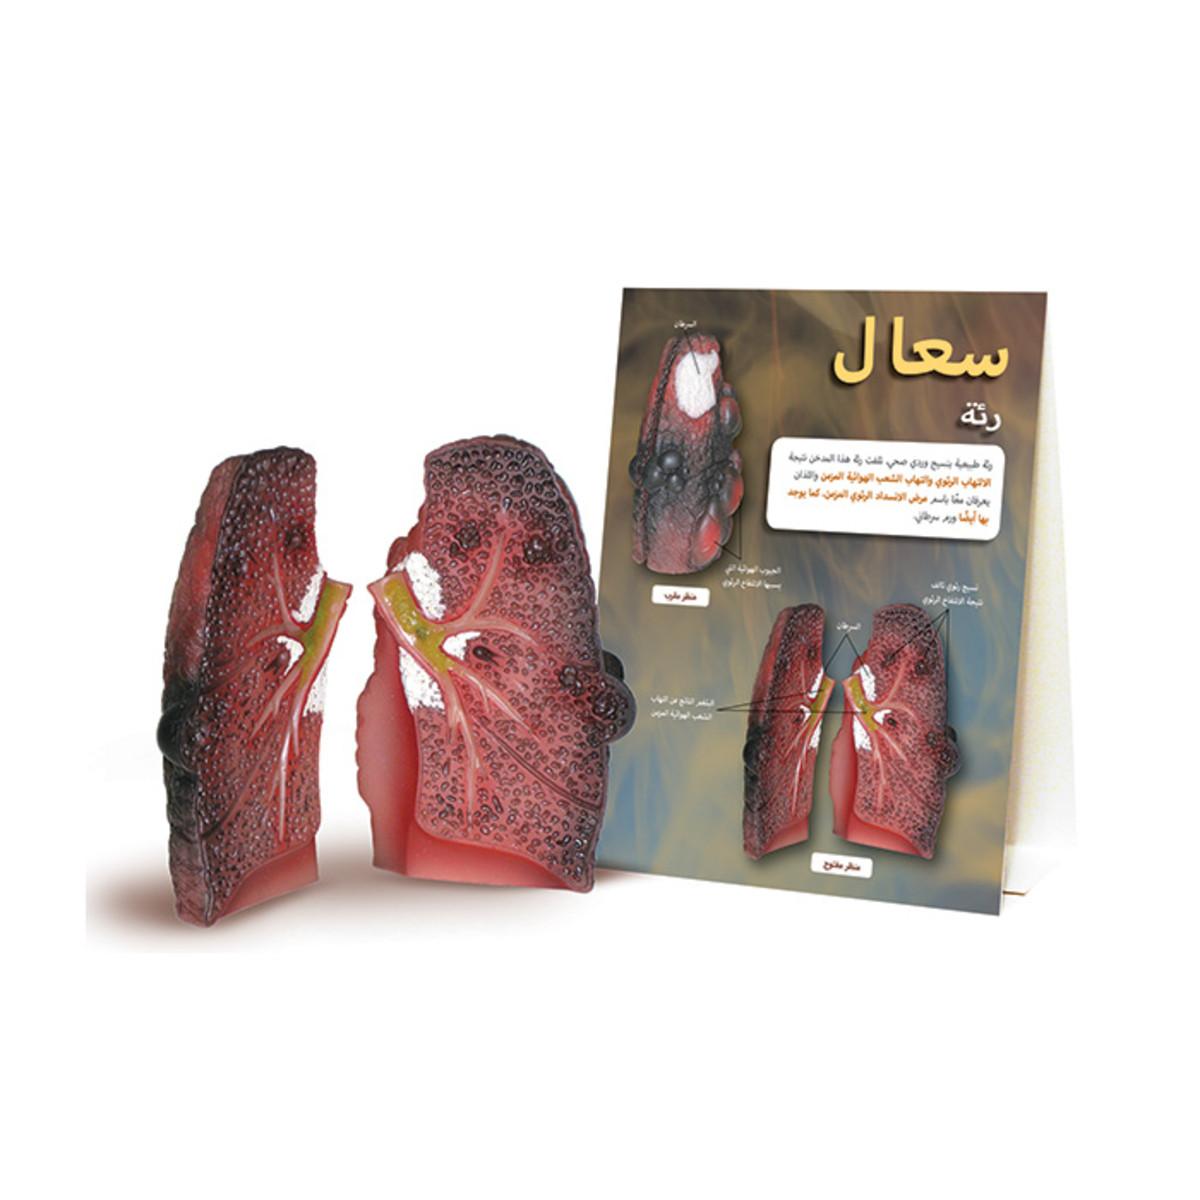 Health Edco; Arabic; health education products; tobacco; cancer; smoking cessation; pulmonary disease; chronic; lung damage